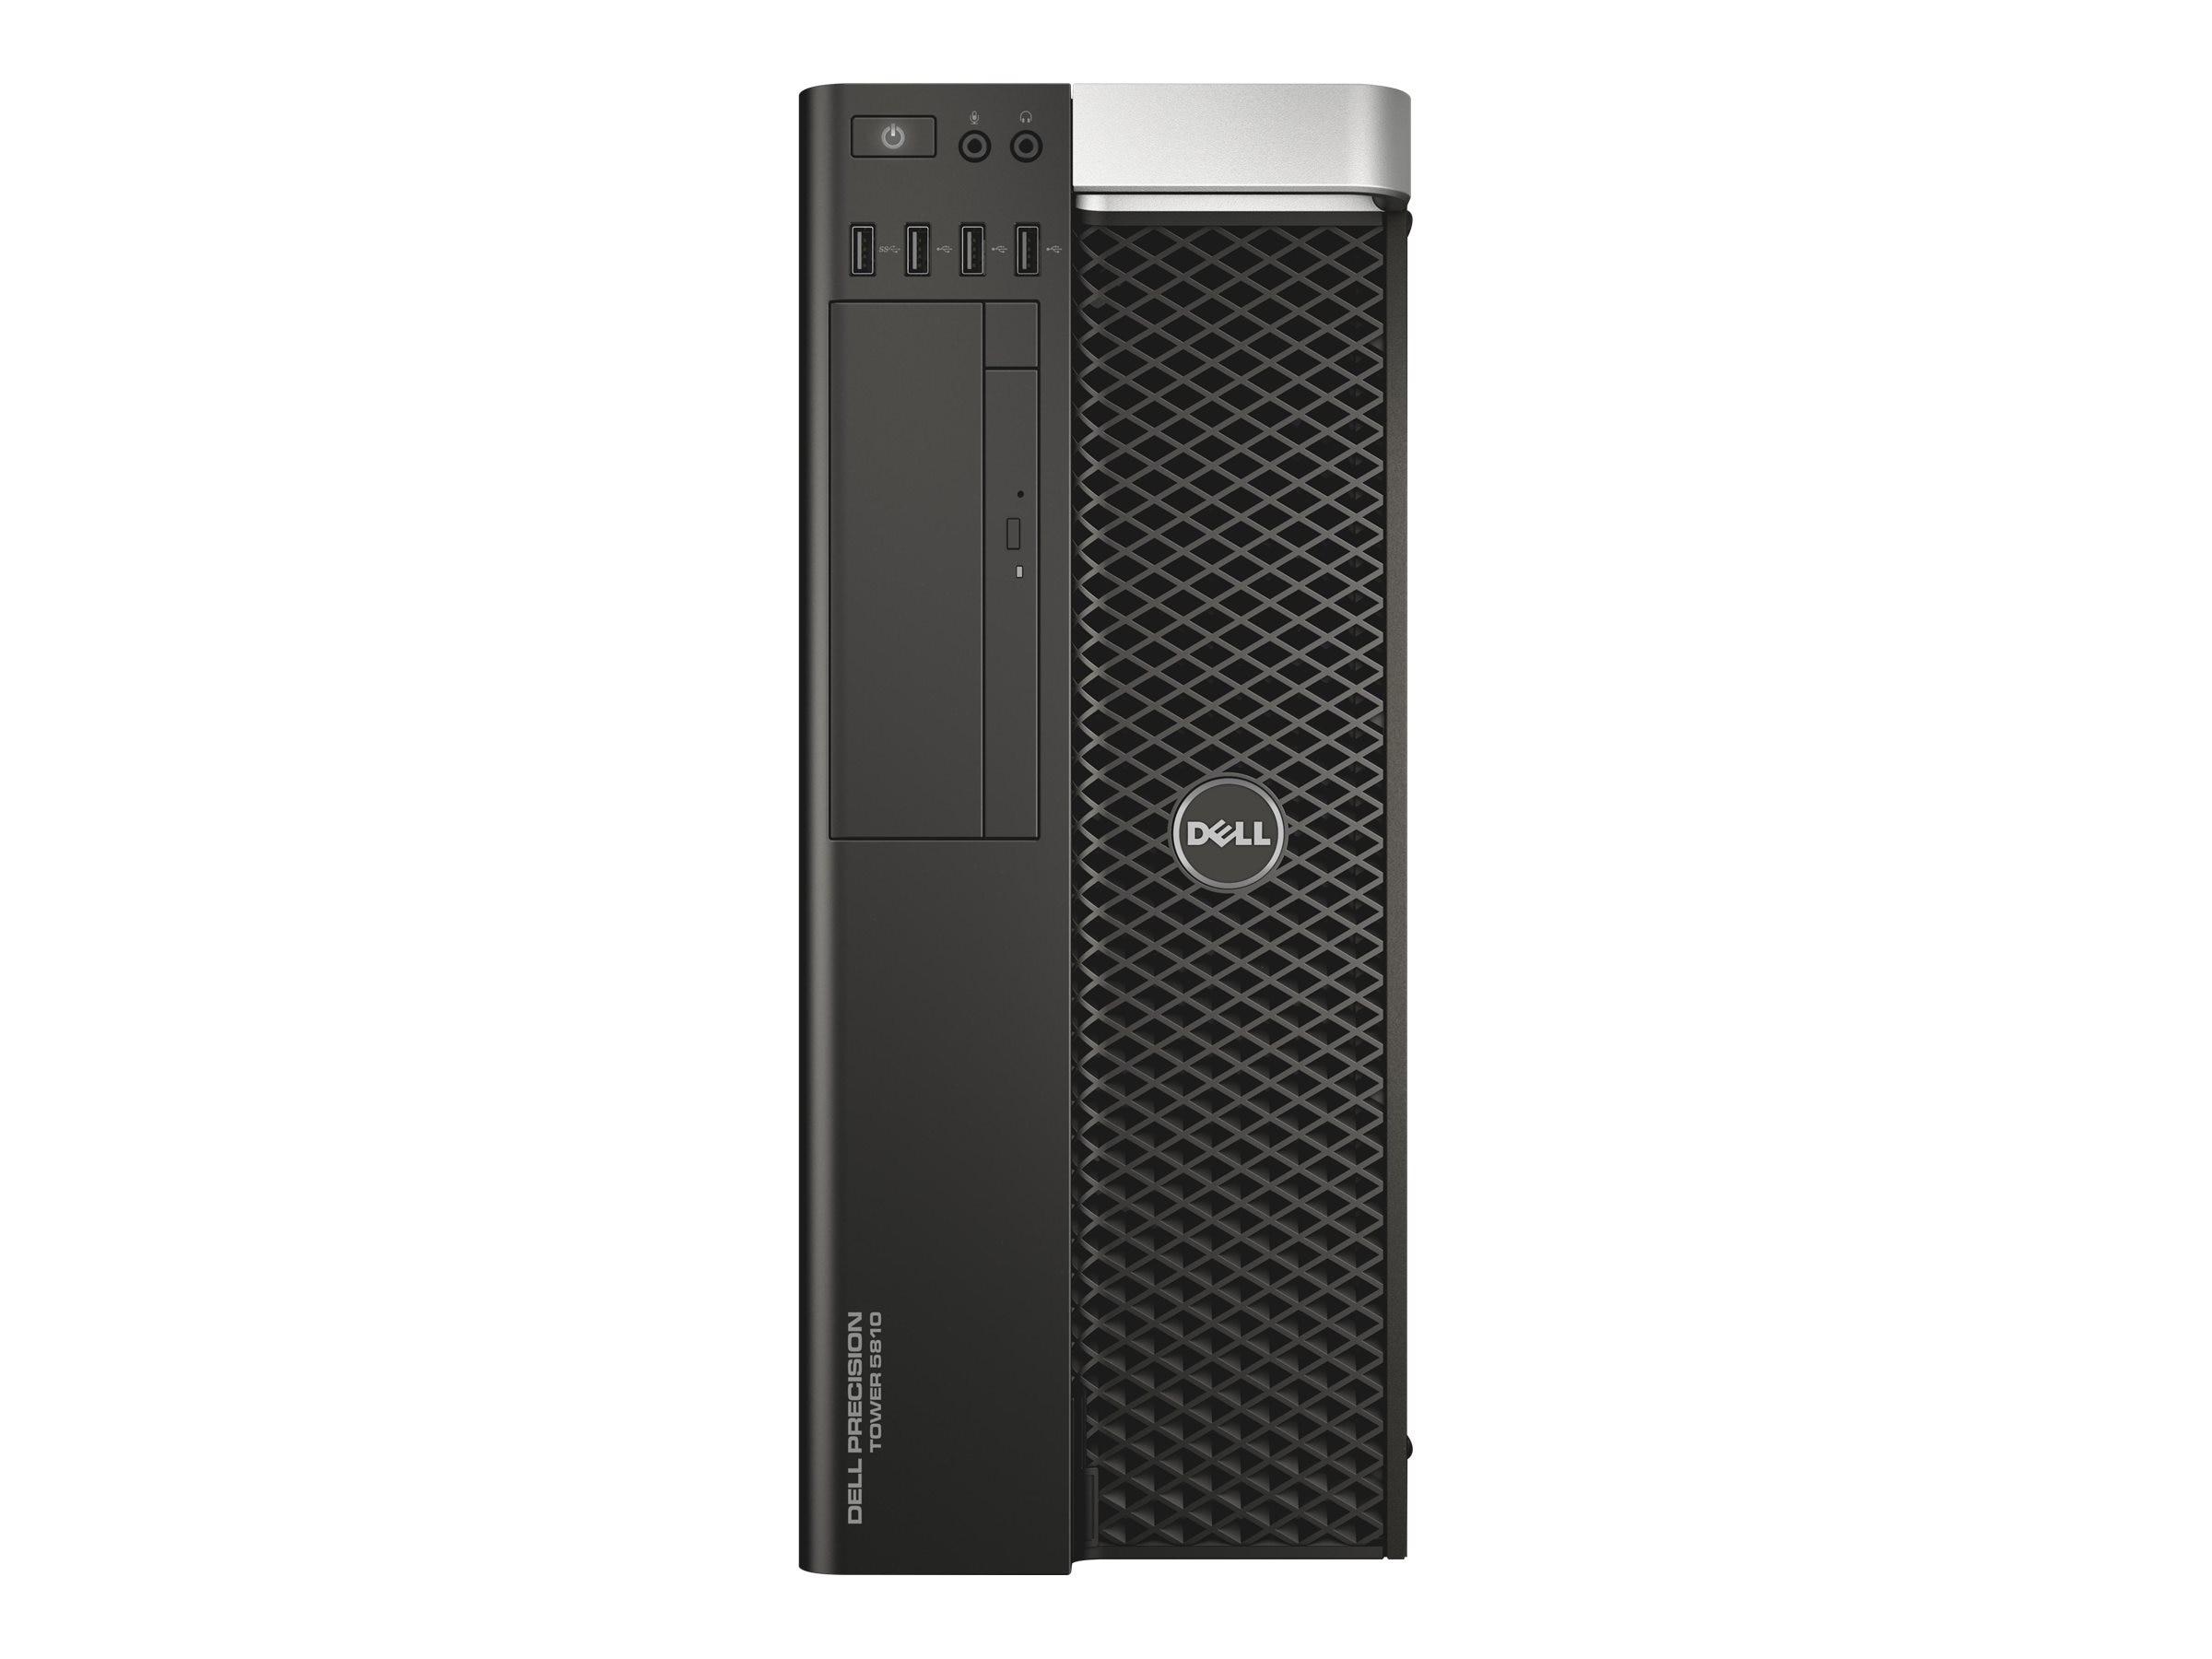 Dell 5DCR2 Image 5